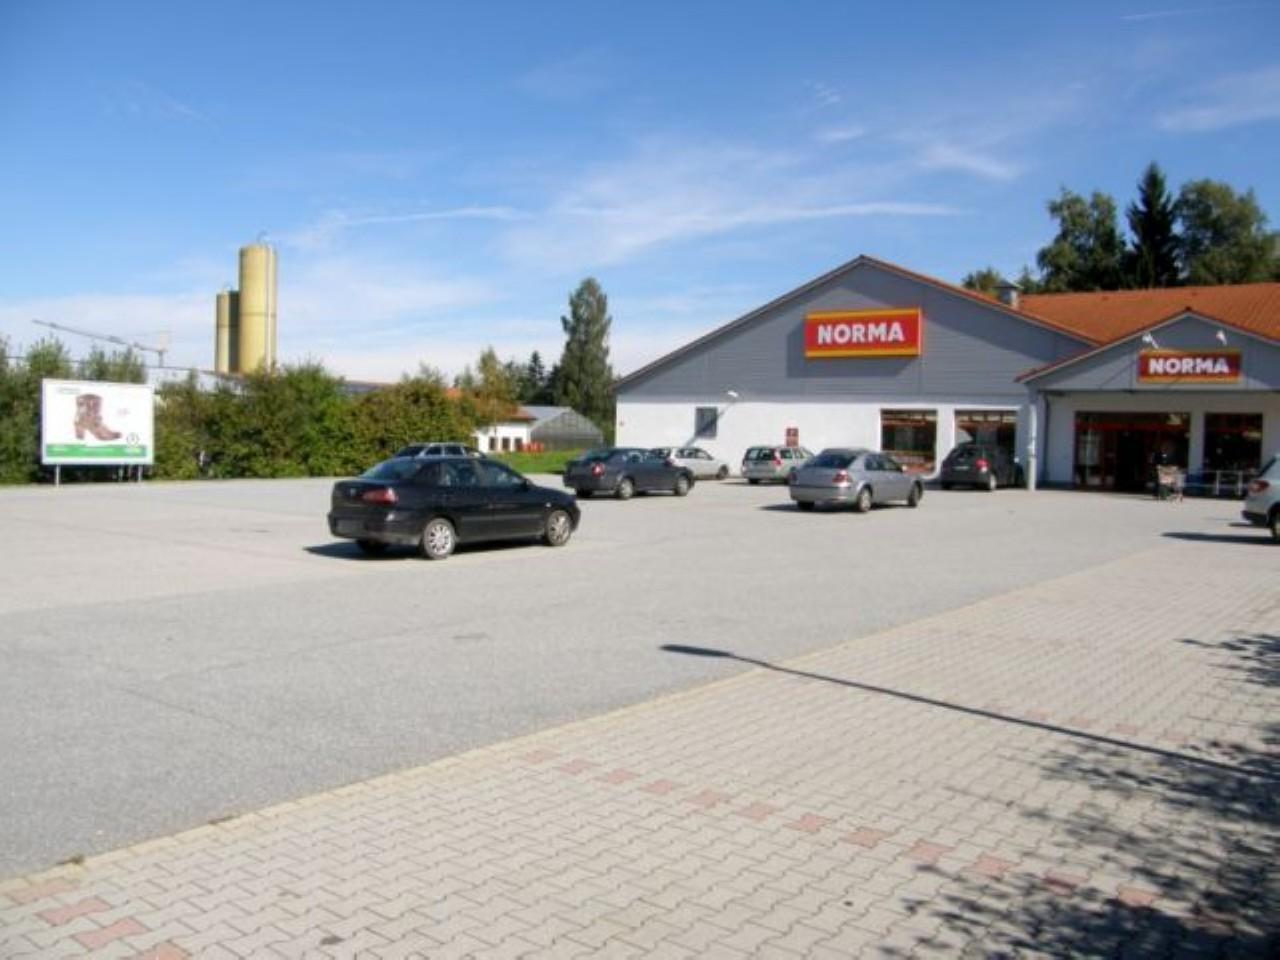 1 2 3 Plakat De Plakatwerbung In 94086 Bad Griesbach I Rottal